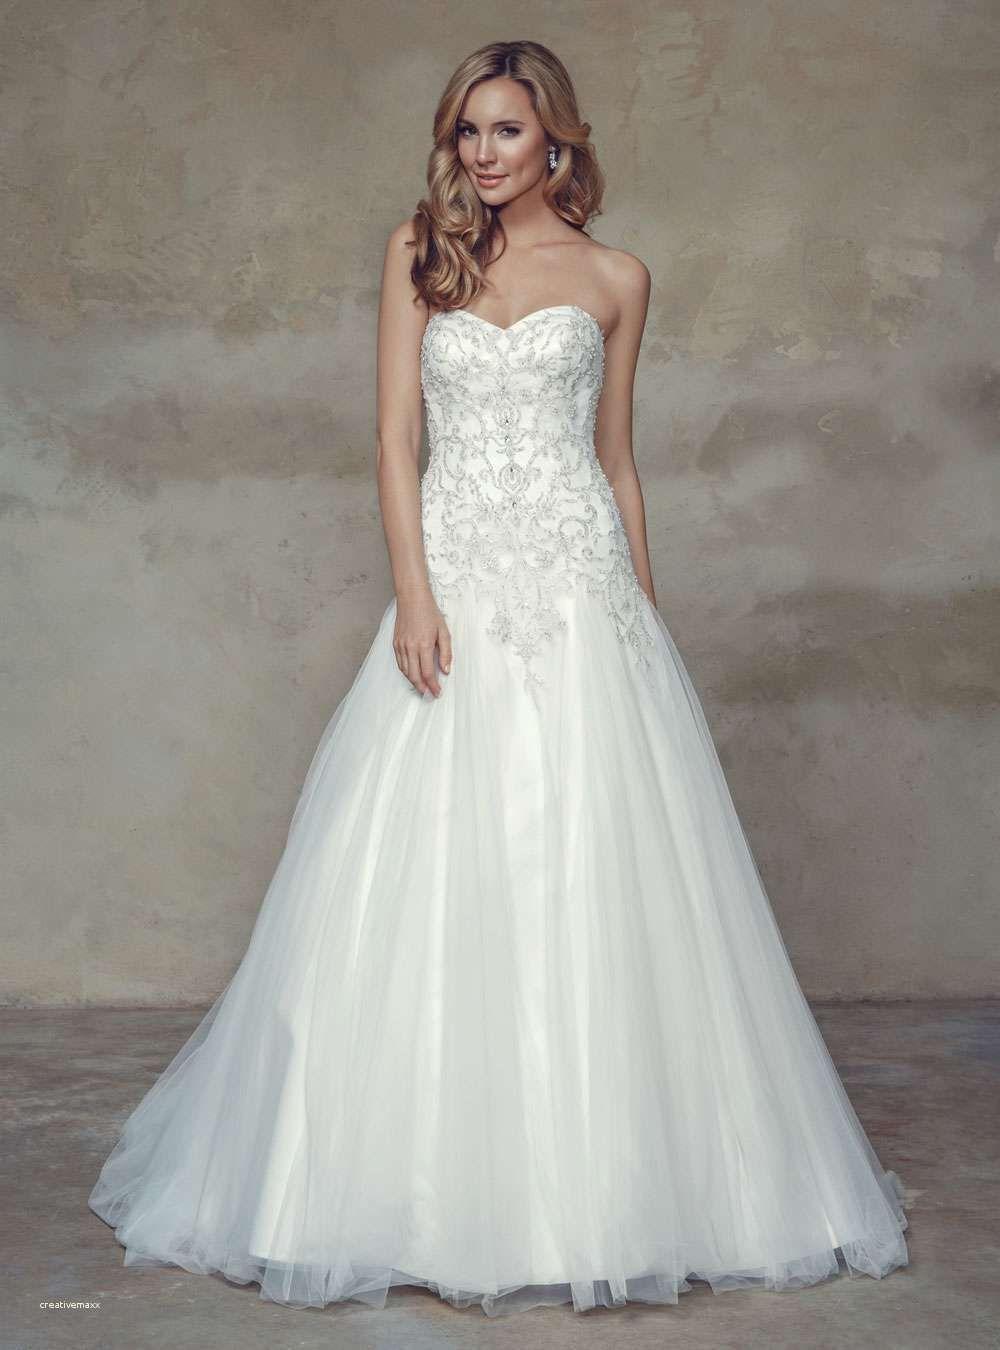 Luxury Princess Strapless Wedding Dresses With Diamonds